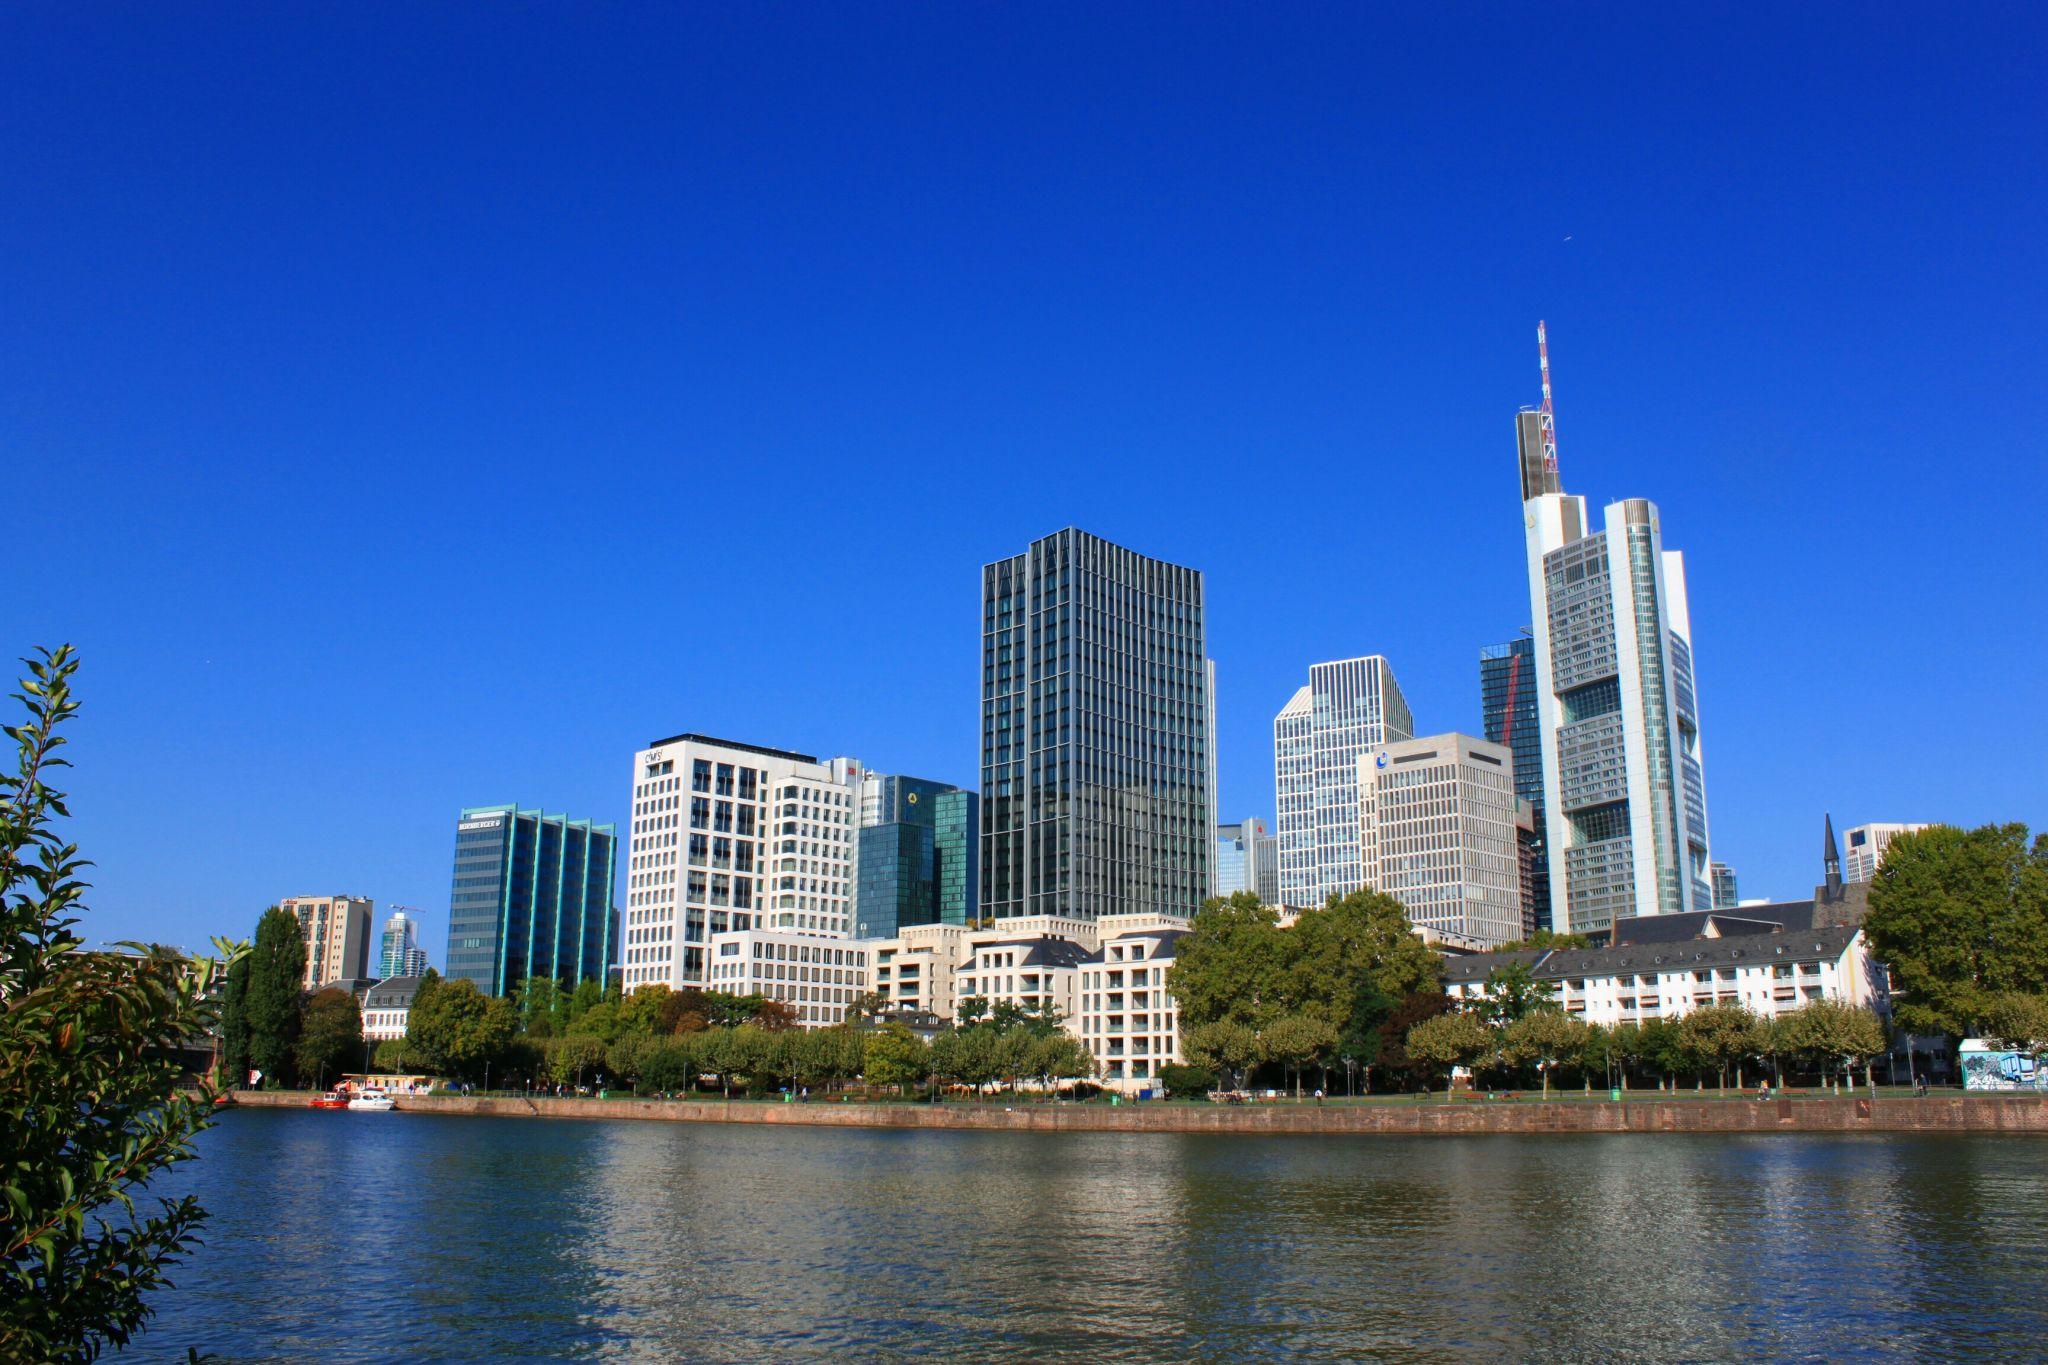 Skyline von Frankfurt am Main, Germany